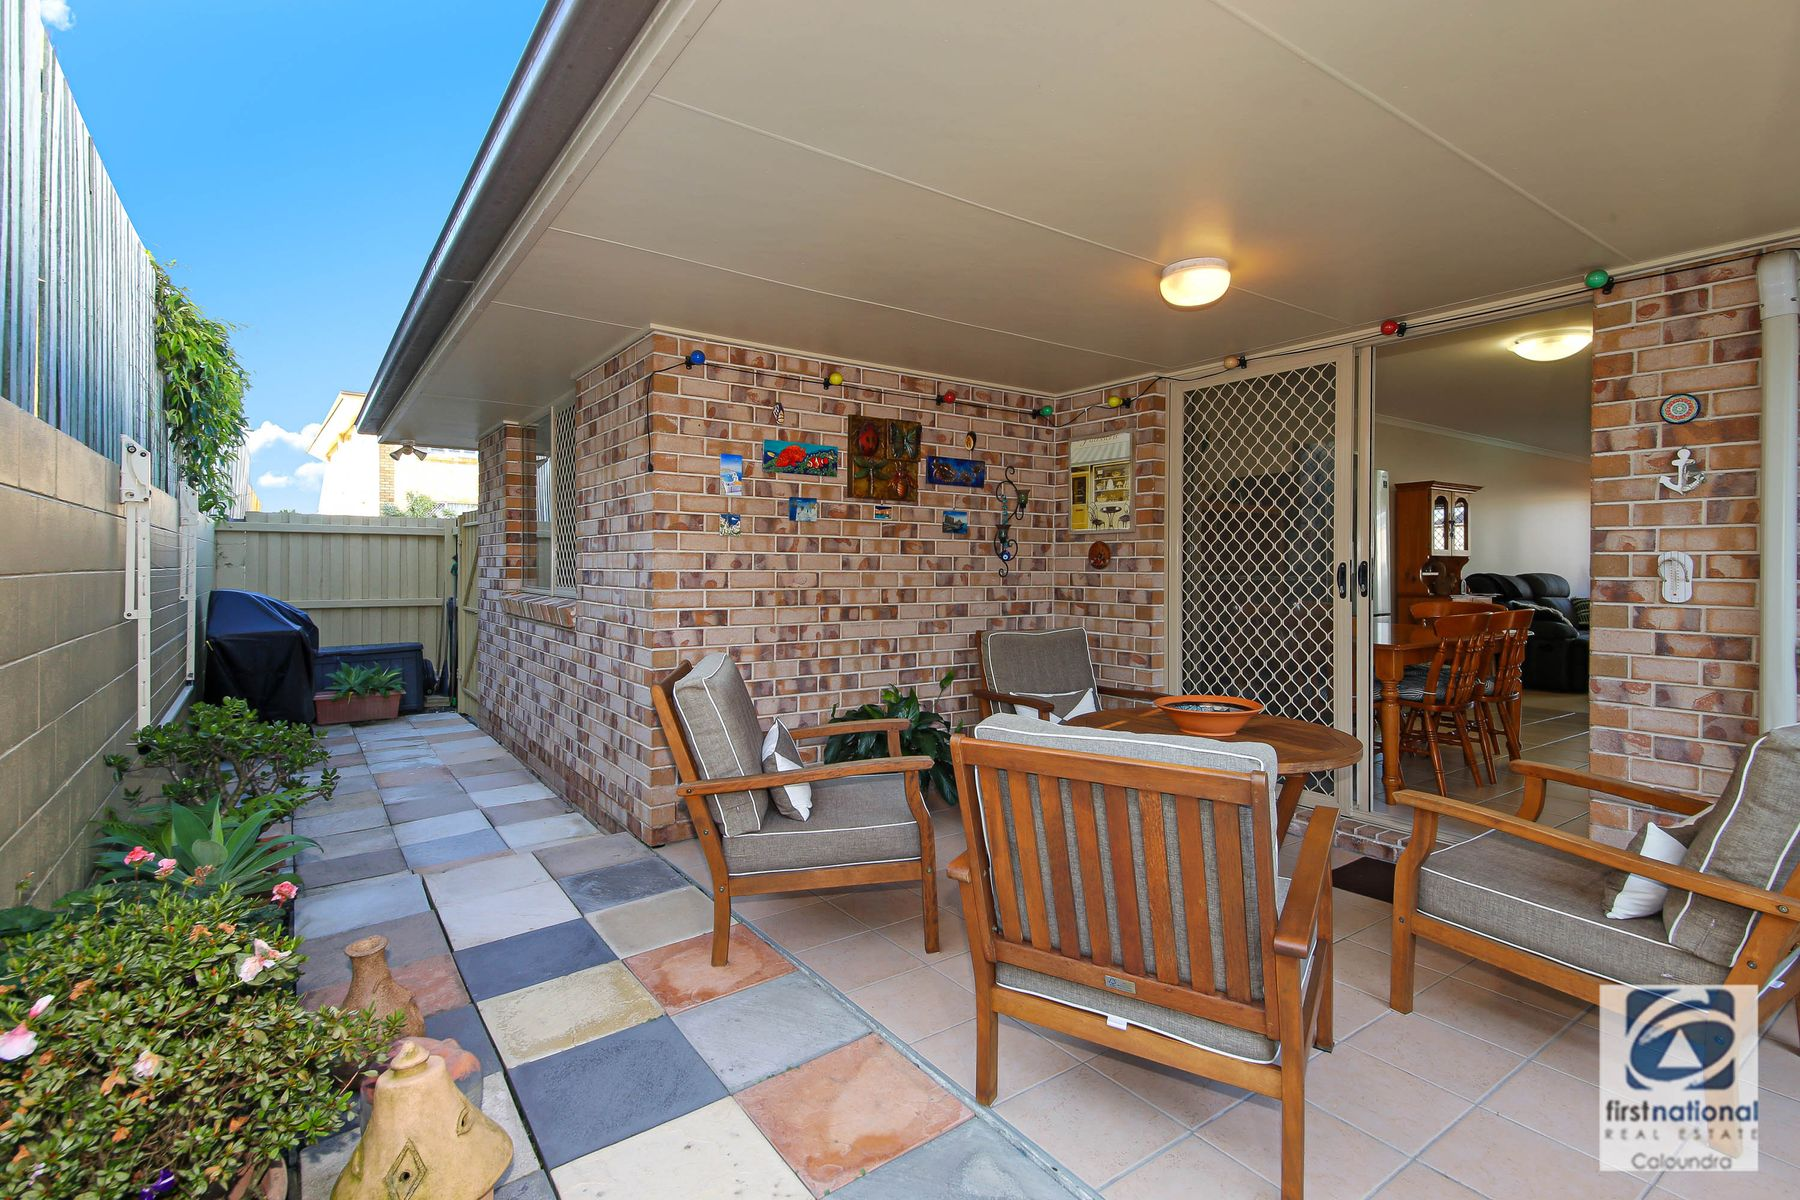 4/75 Caloundra Road, Little Mountain, QLD 4551